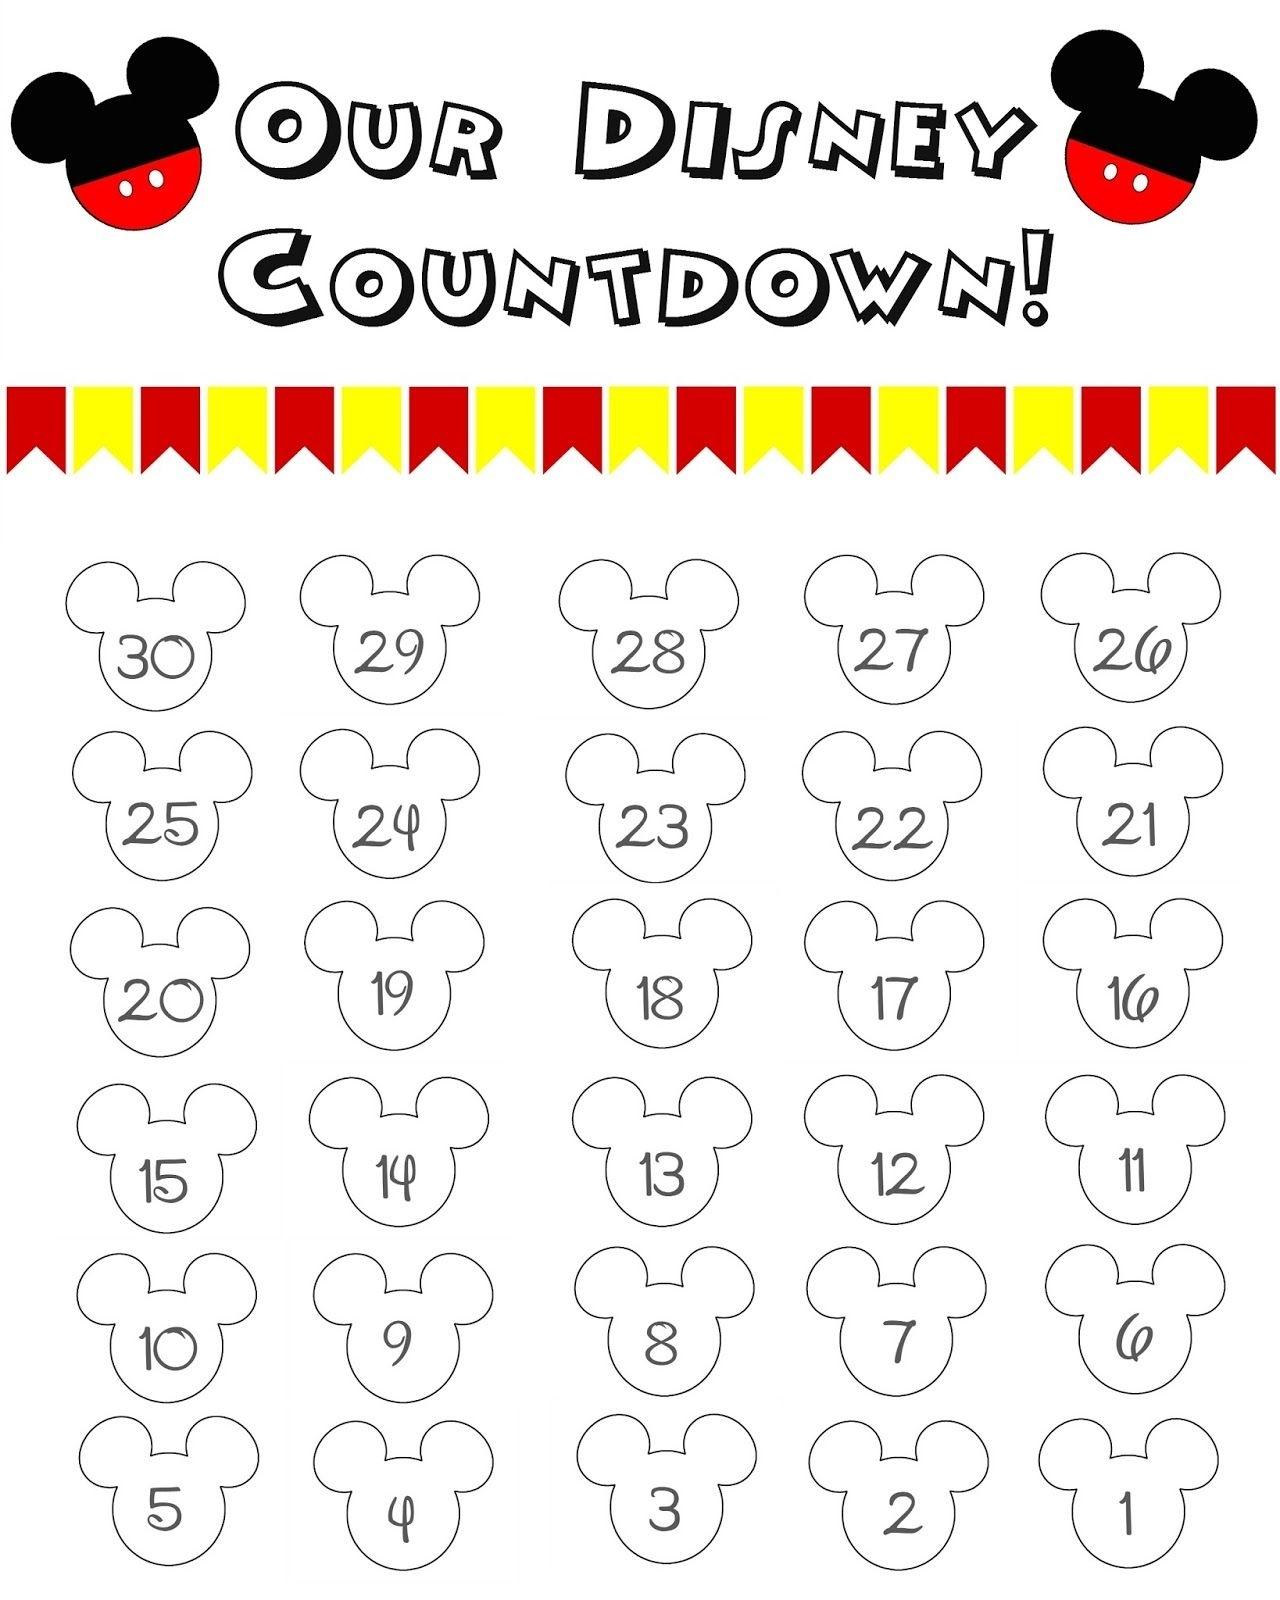 Disney Countdown Calendar Template | Monthly Printable Calender pertaining to Make A Countdown Calendar Printable